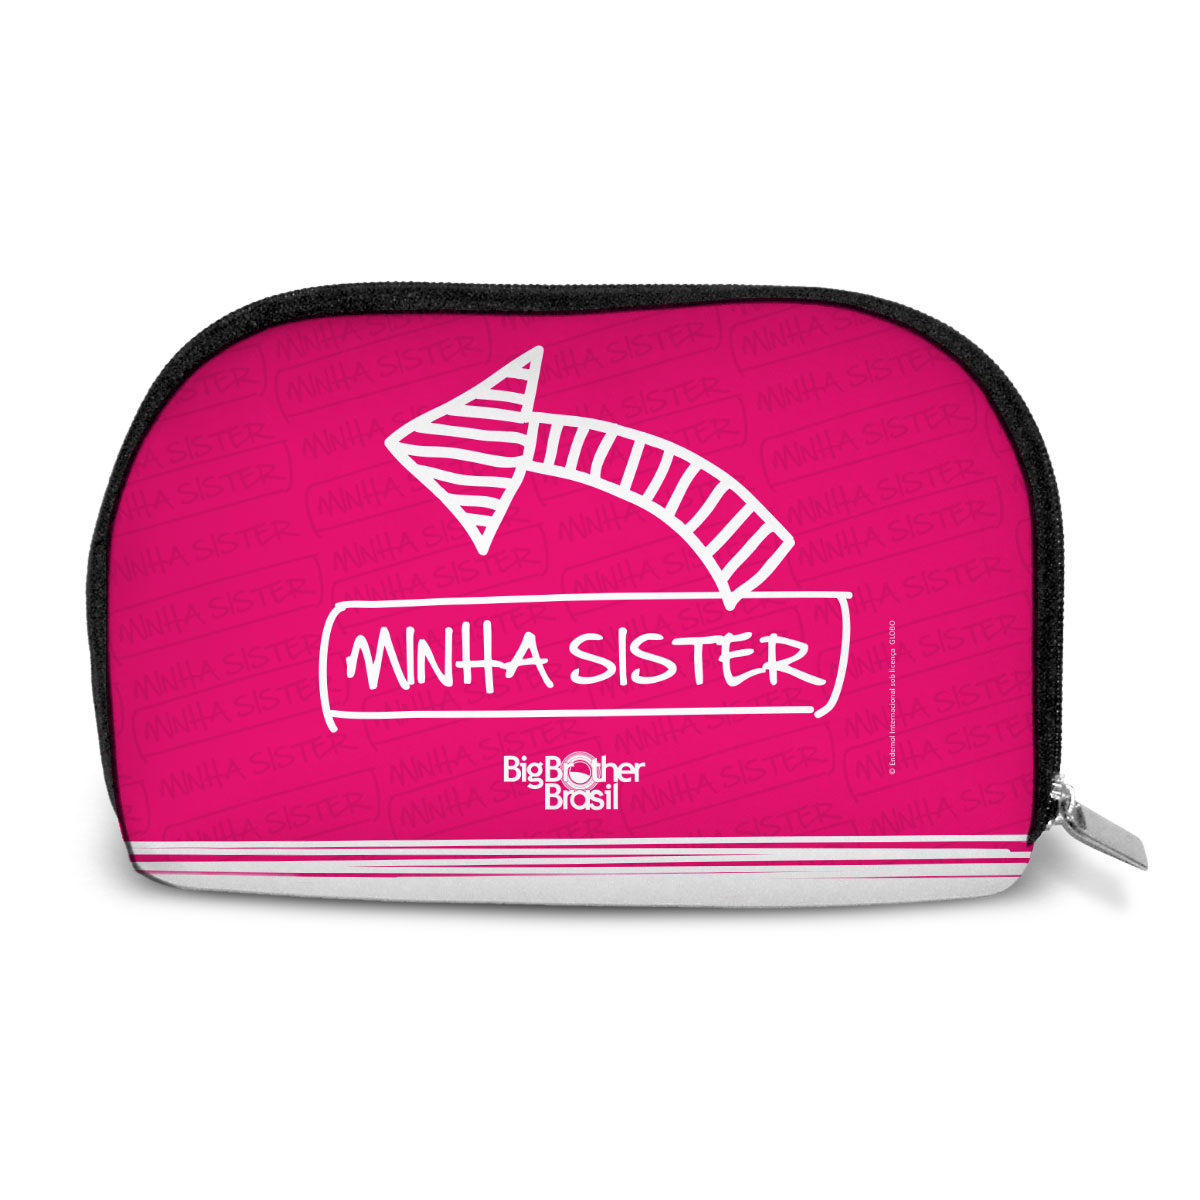 Necessaire Big Brother Brasil 15 Minha Sister